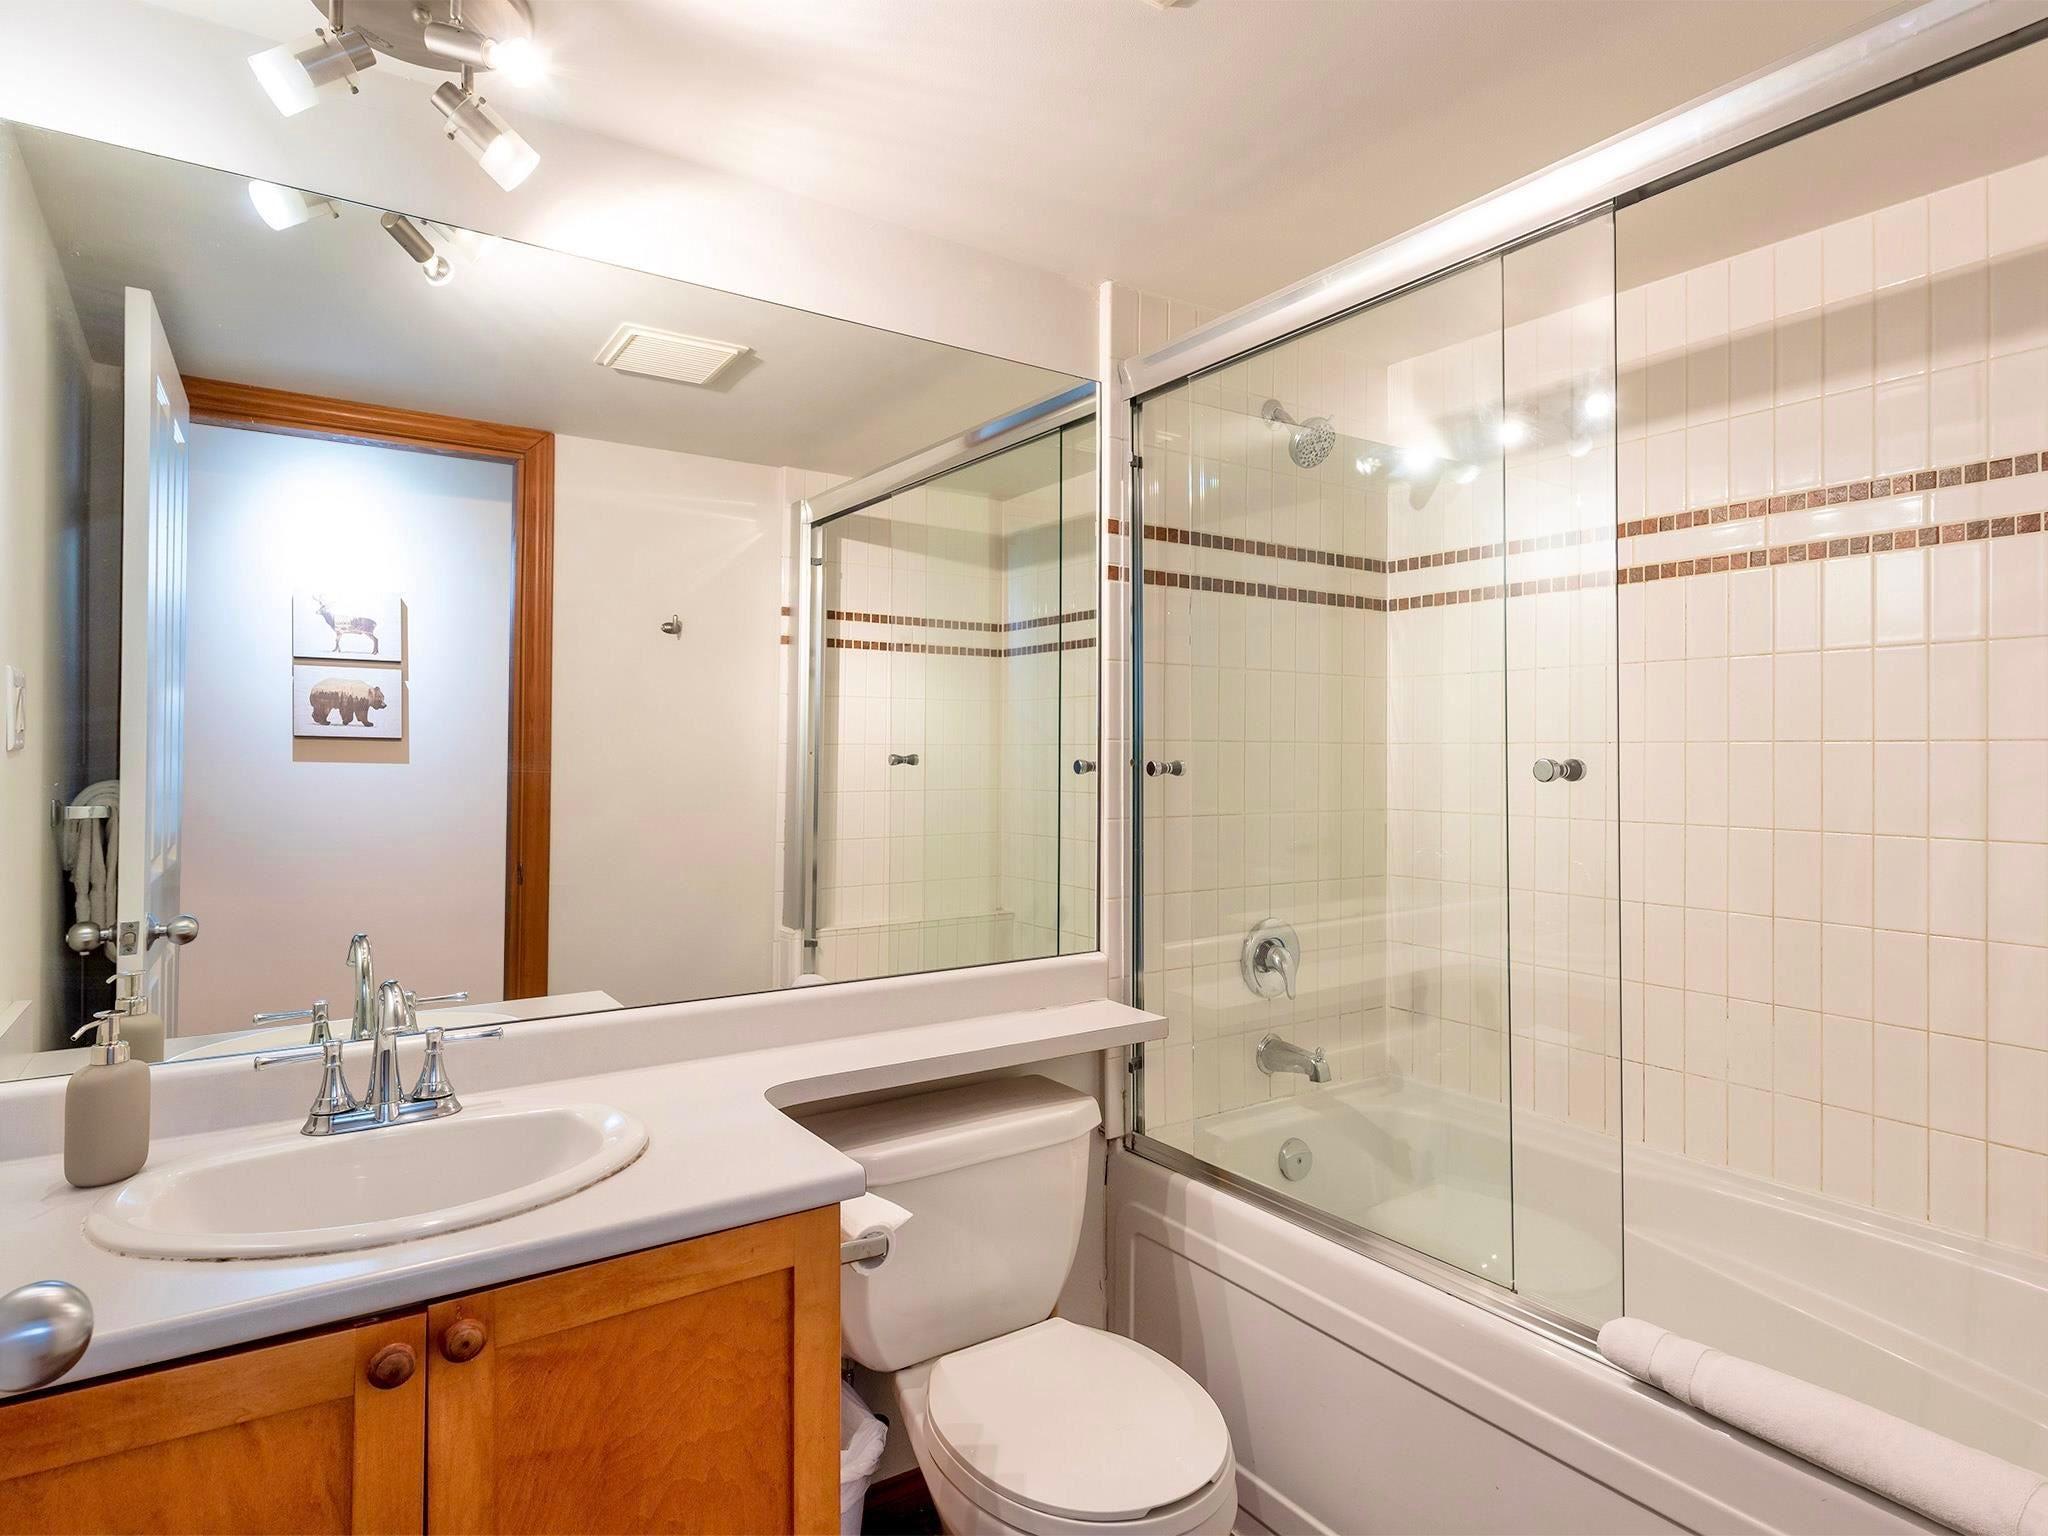 73 4388 NORTHLANDS BOULEVARD - Whistler Village Townhouse for sale, 2 Bedrooms (R2580863) - #15